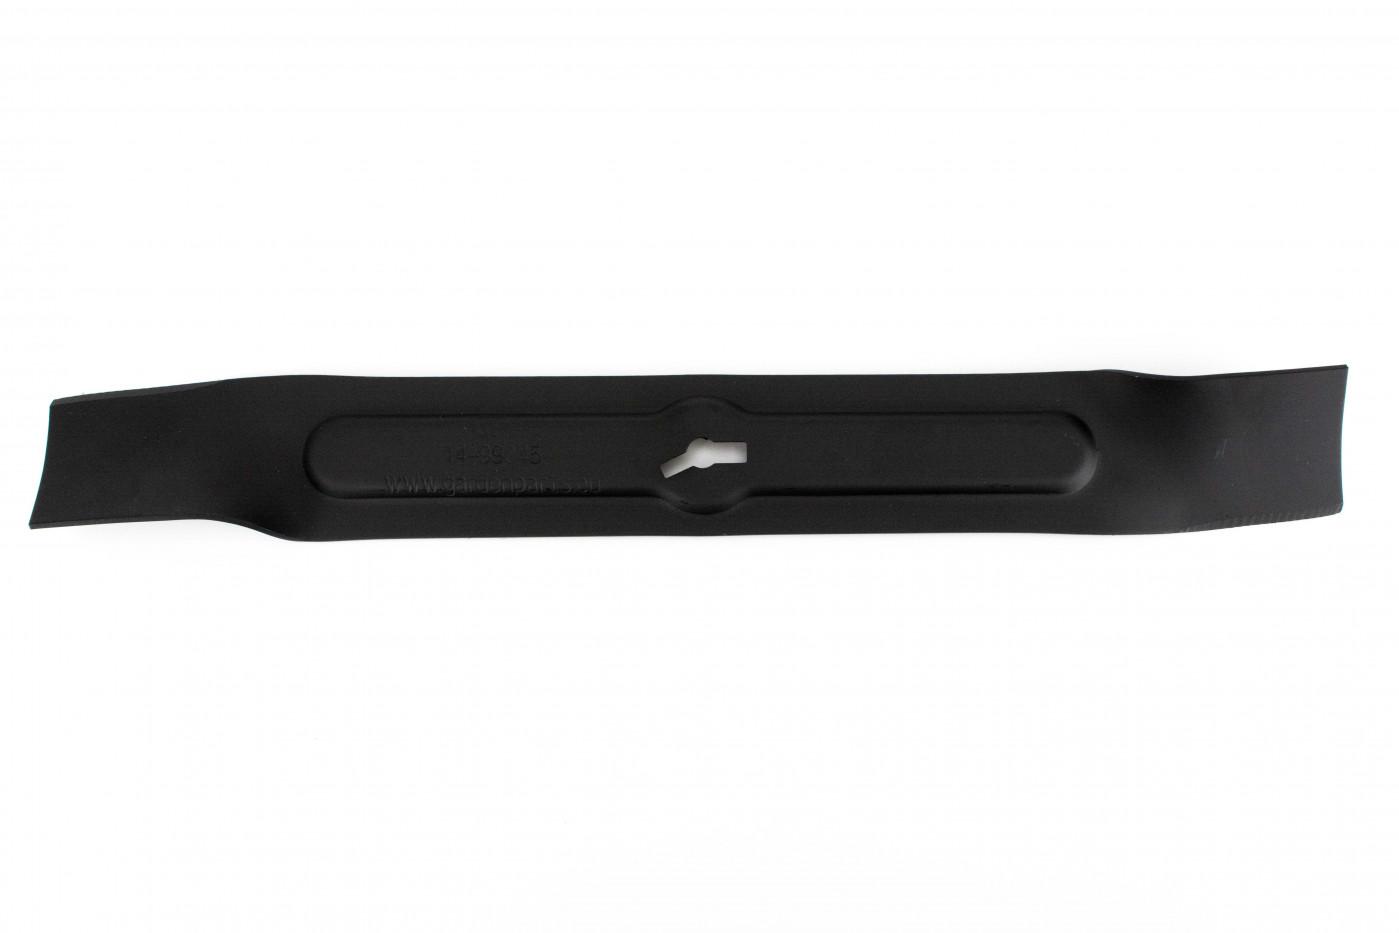 "Nůž elektrických sekaček EINHELL CASTORAMA LEROY MERLIN 15"" (36,90 cm) 618817"